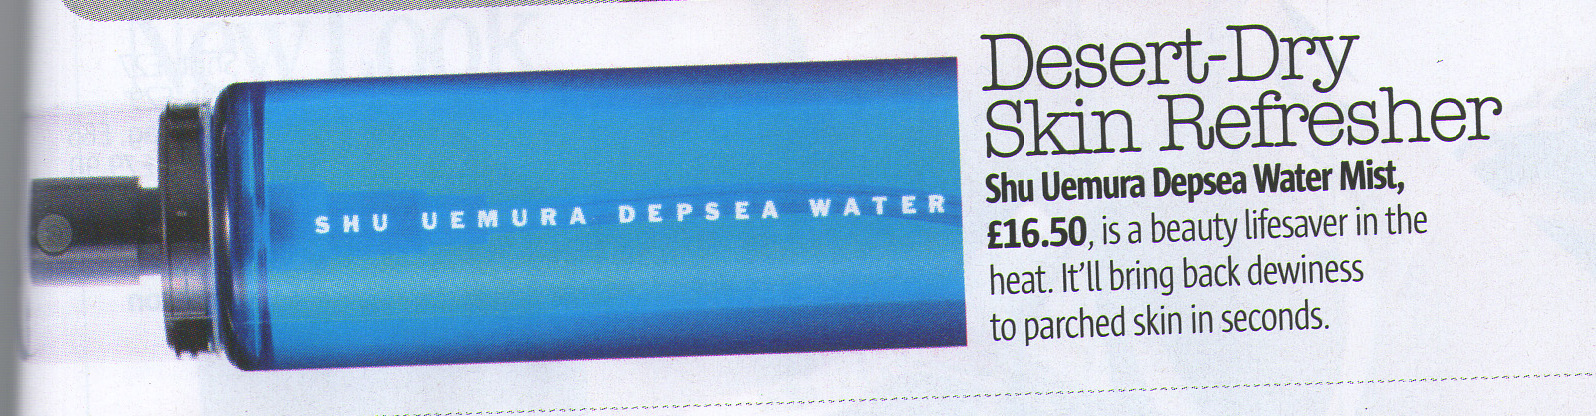 Skin Refresher/Dubai/Beauty Blogger/LOOK magazine/Shuemera